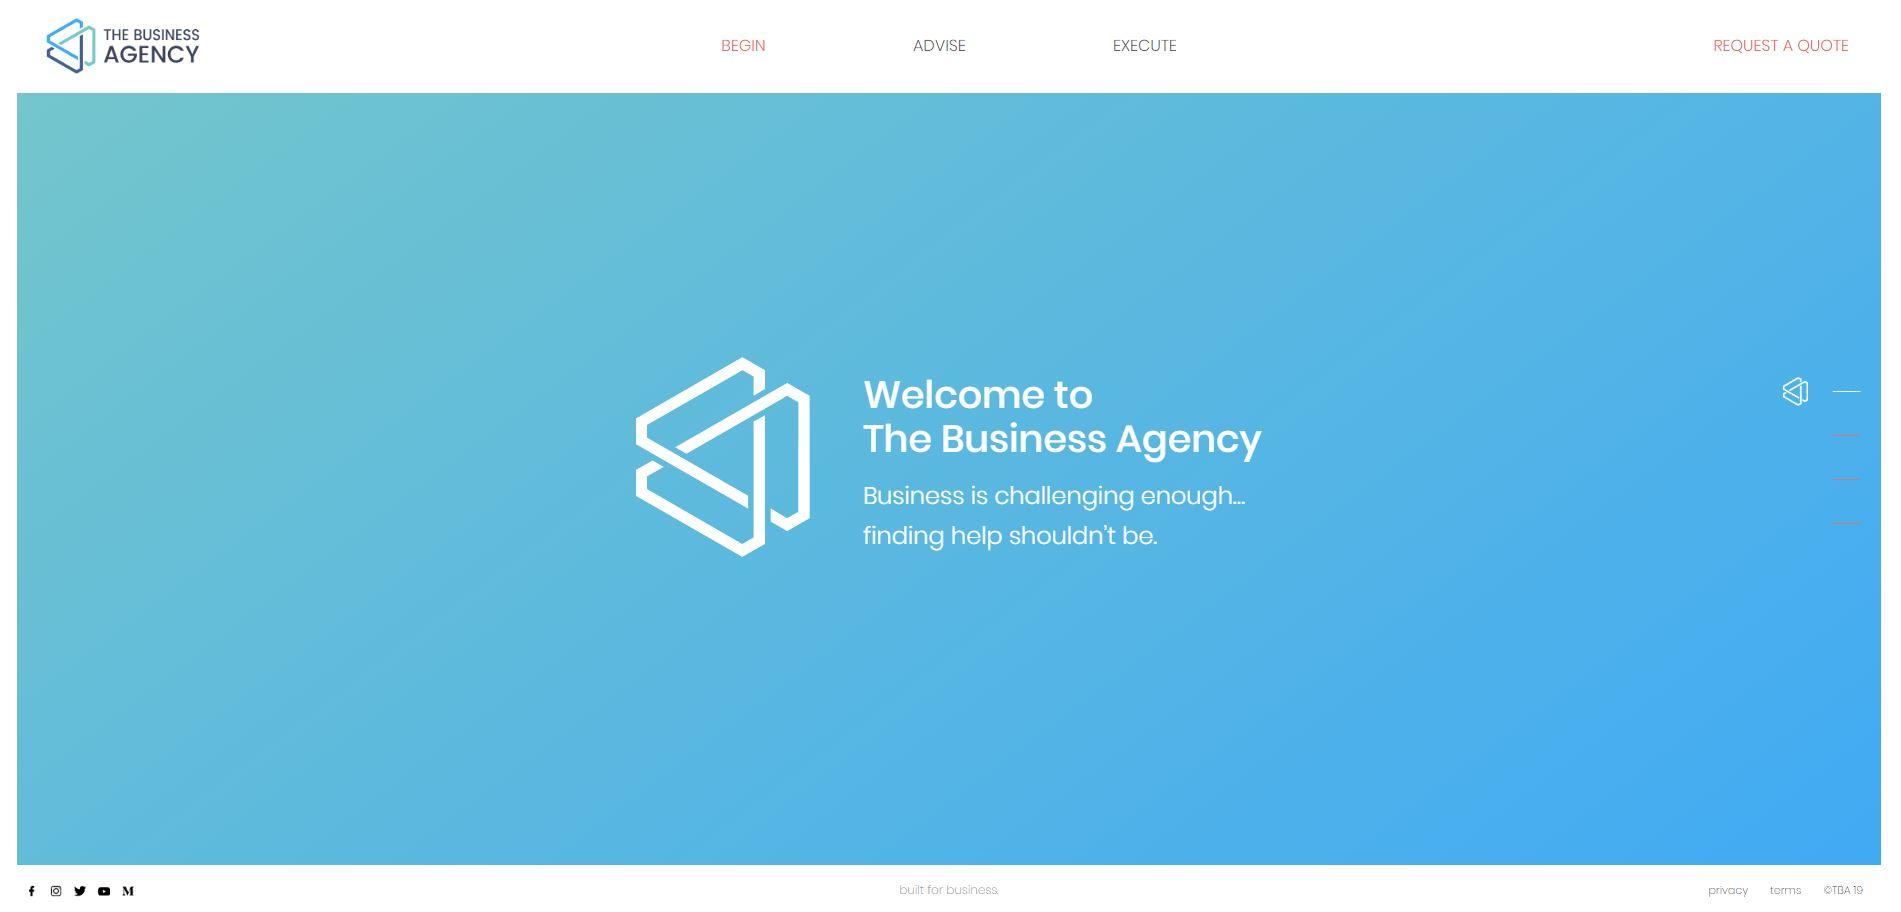 The Business Agency Work by Alisha Rosen